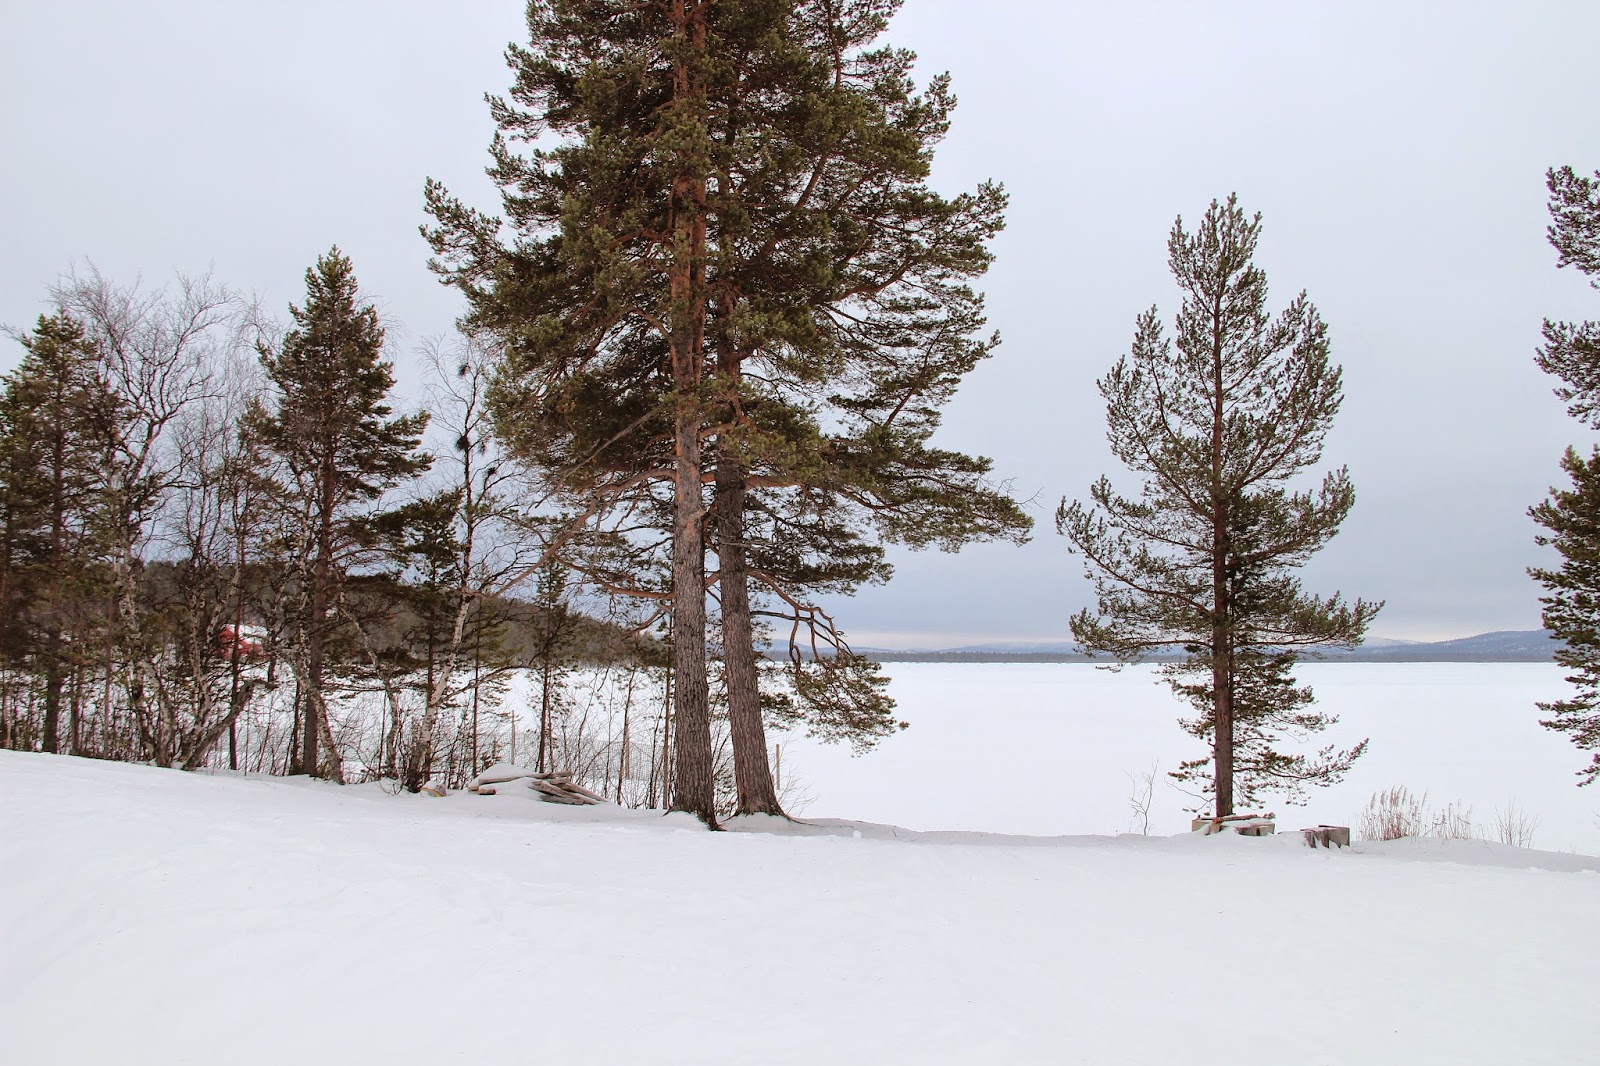 Frozen Lake Menesjarvi, Finland